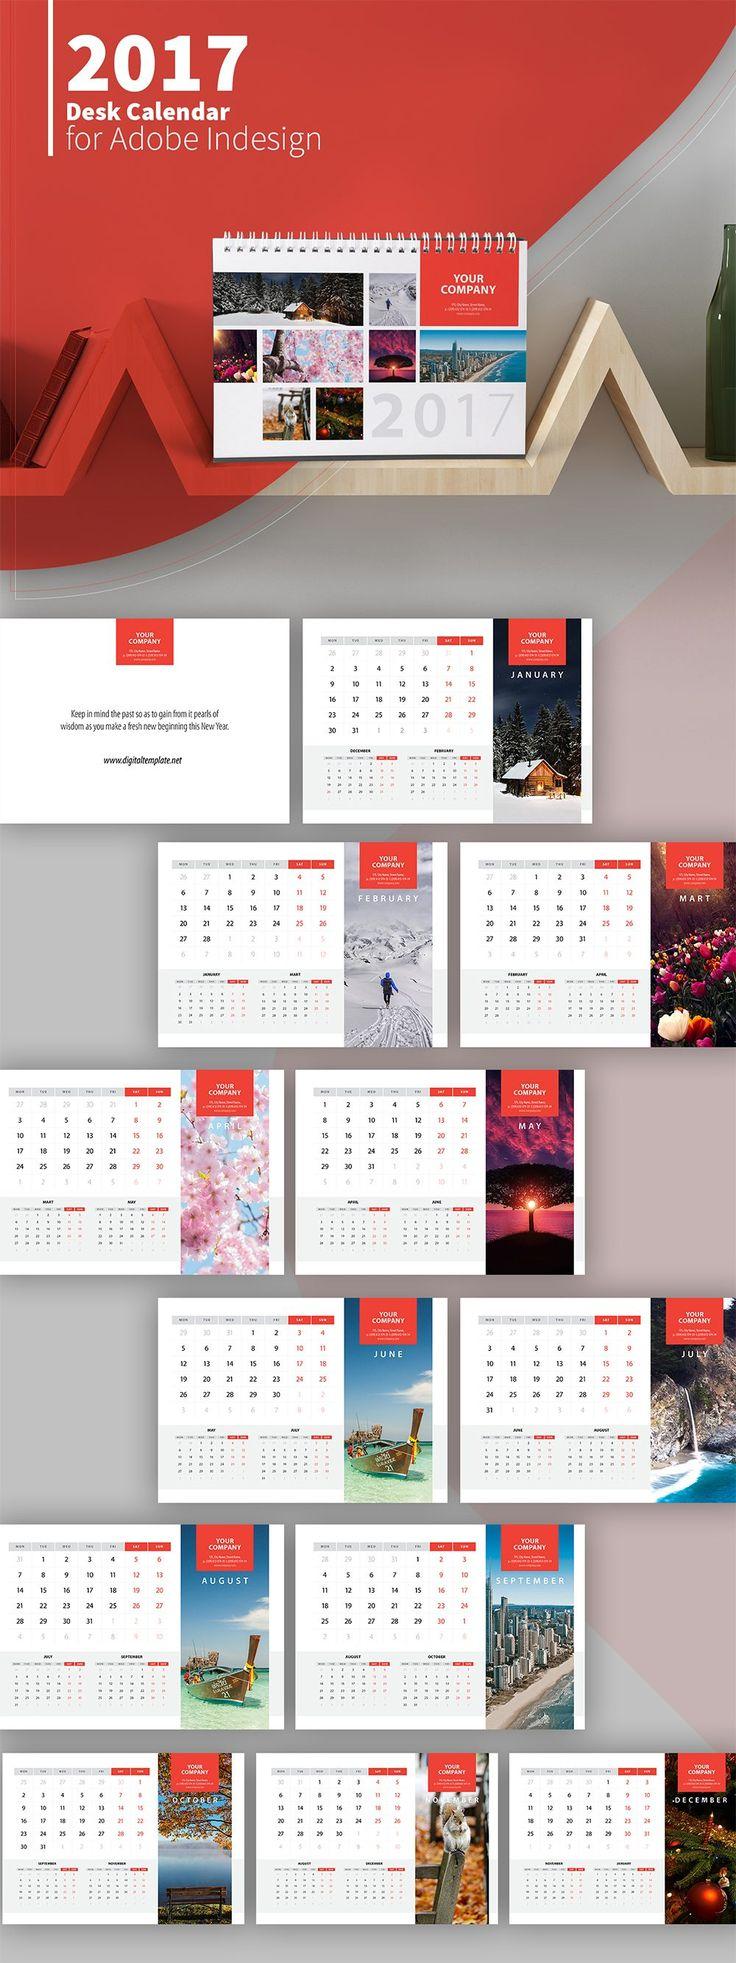 Calendar Templates Graphic Design : Best corporate calendar design images on pinterest